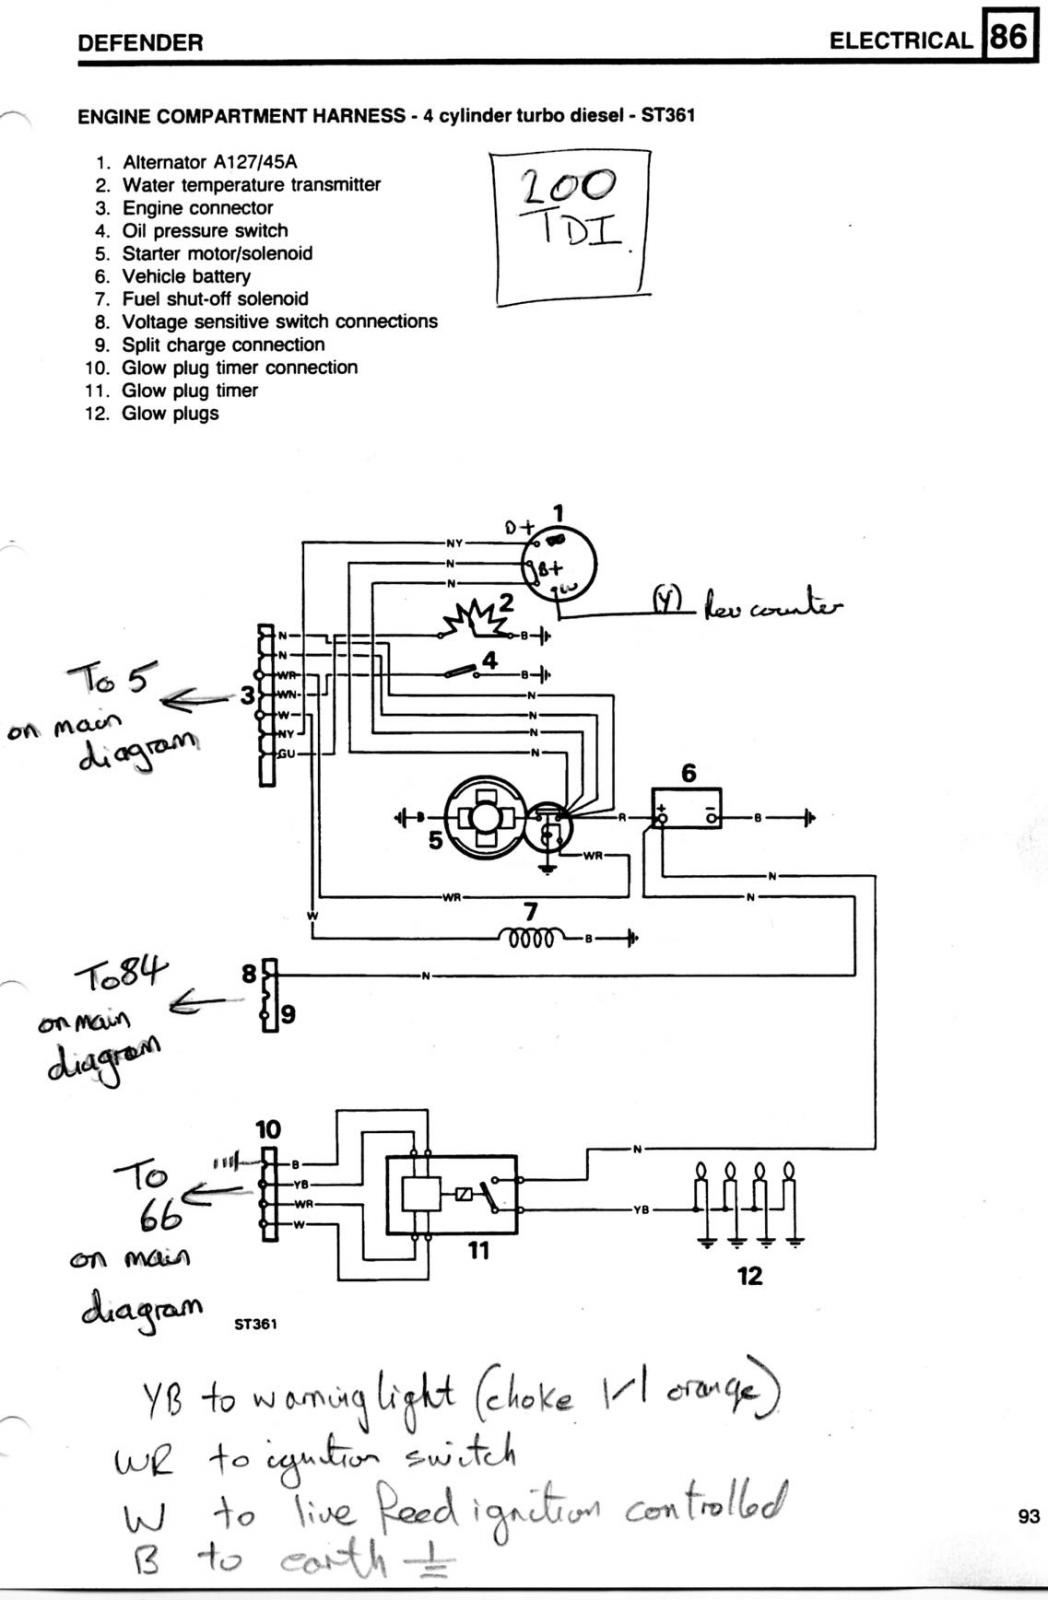 hight resolution of defender wiring defender forum lr4x4 the land rover forum defender 110 200 tdi engine wiring diagram